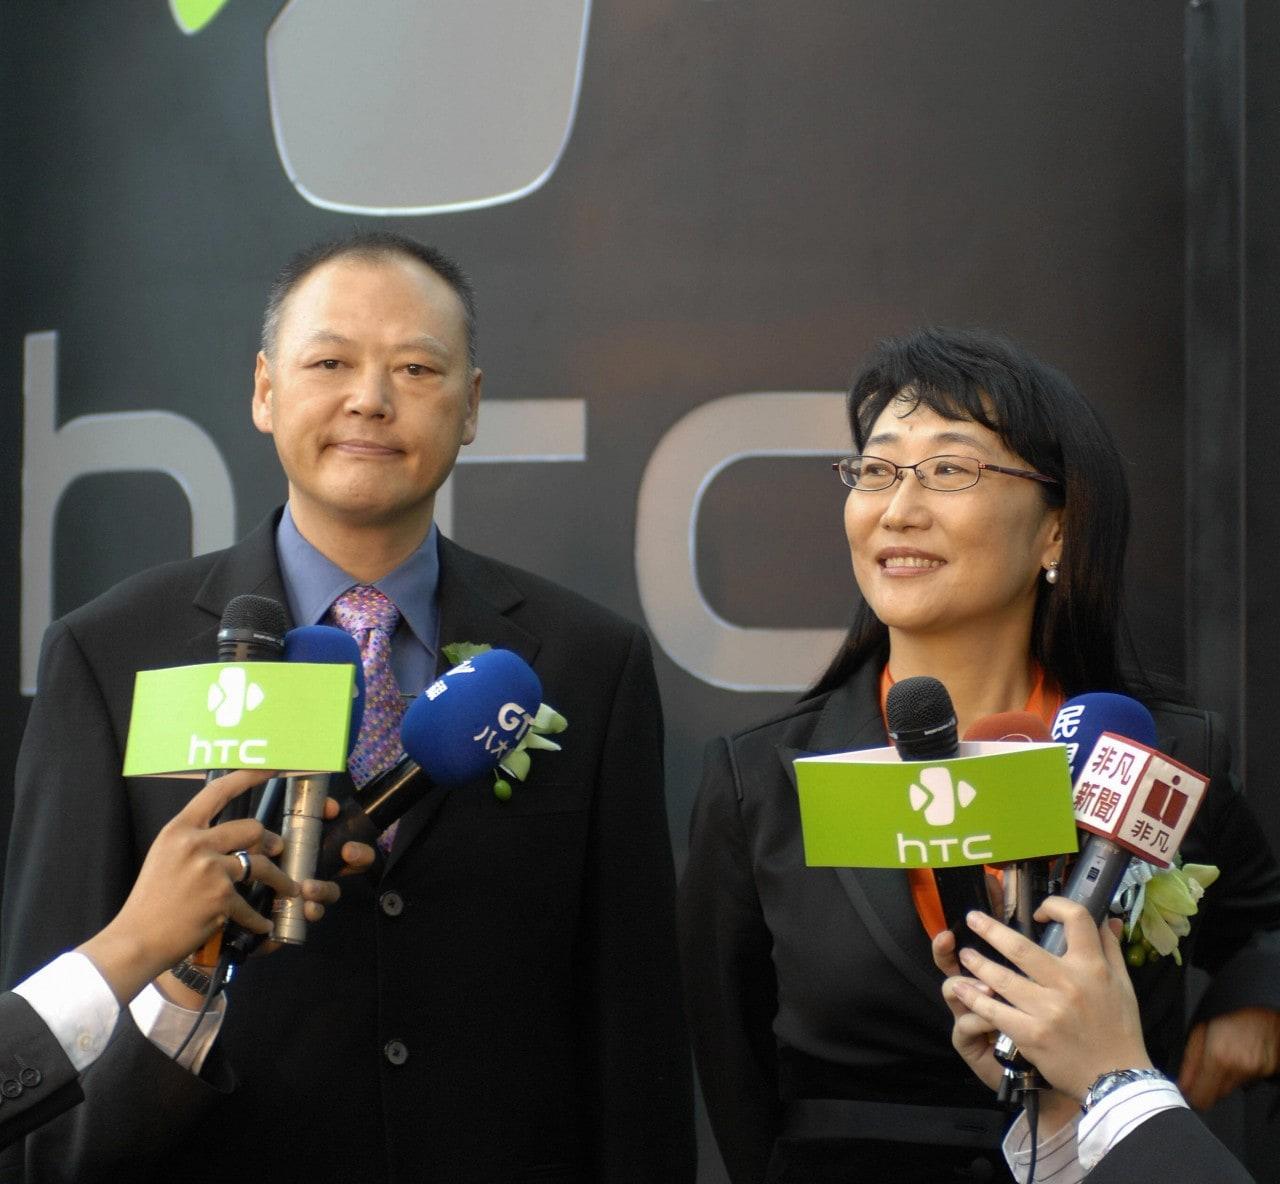 Peter Chou rimpiazzato da Cher Wang alla guida di HTC